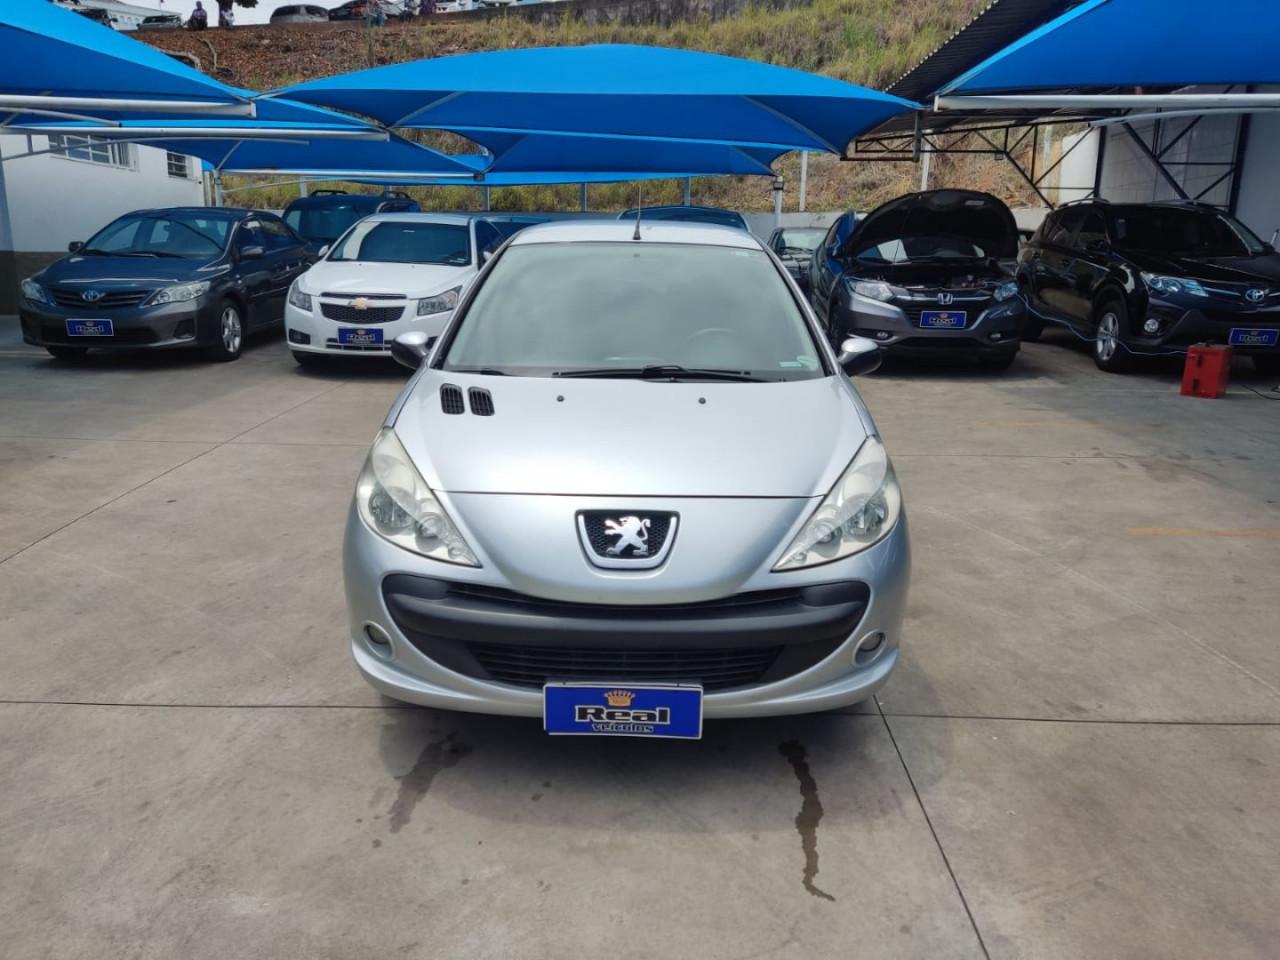 207 Hatch 1.4 XR FLEX